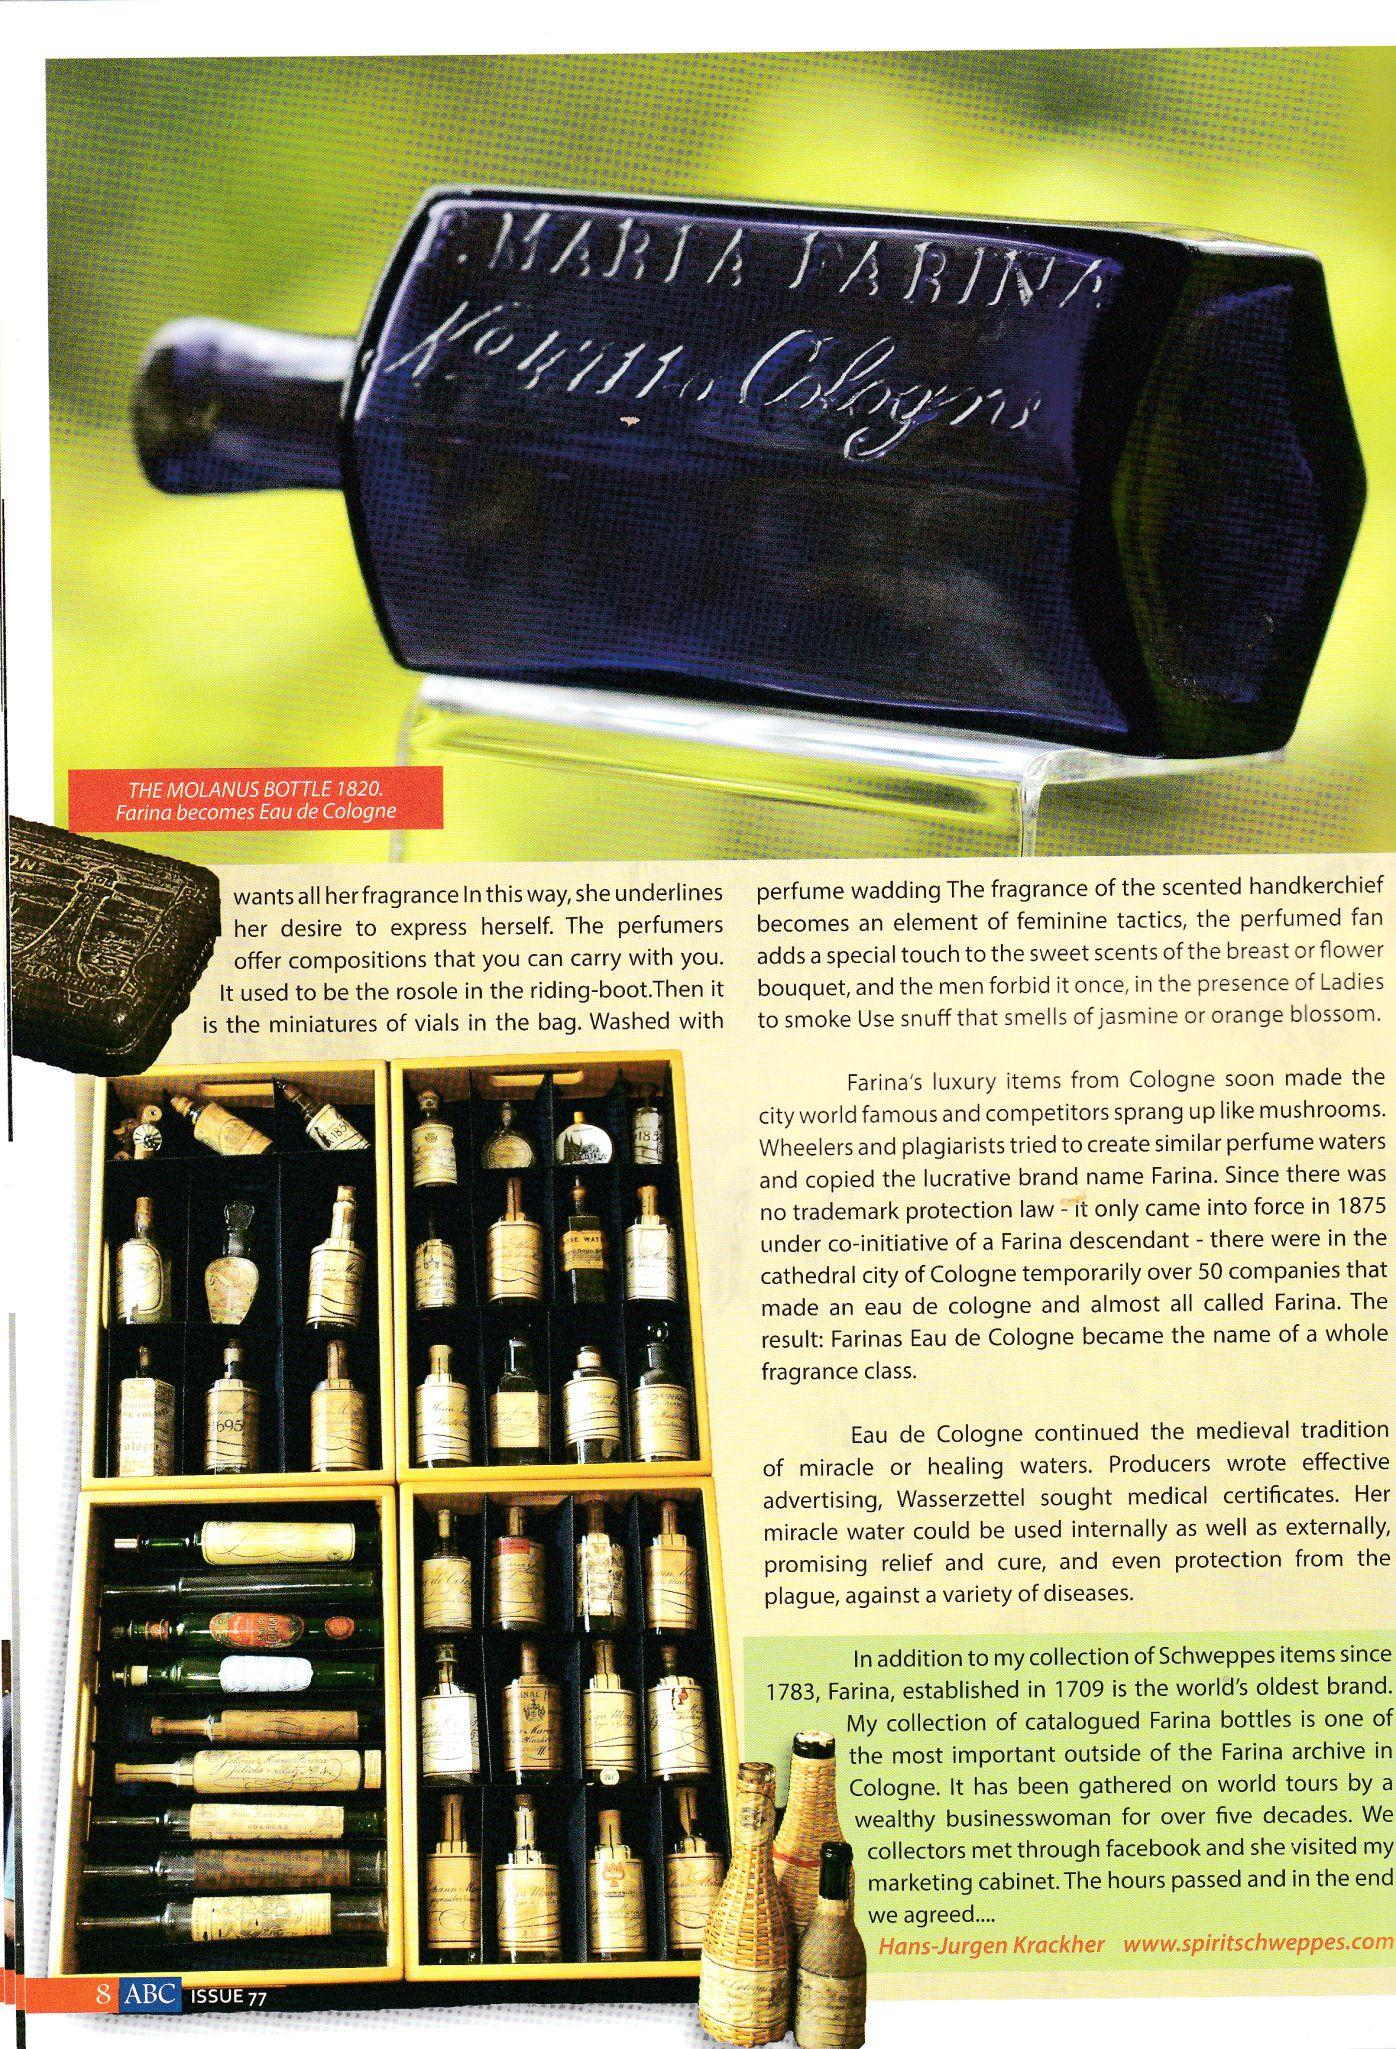 Spiritschweppes Marketing Cabinet Storytelling The Heritage Of Marketing Bottle Marketing Fragrance